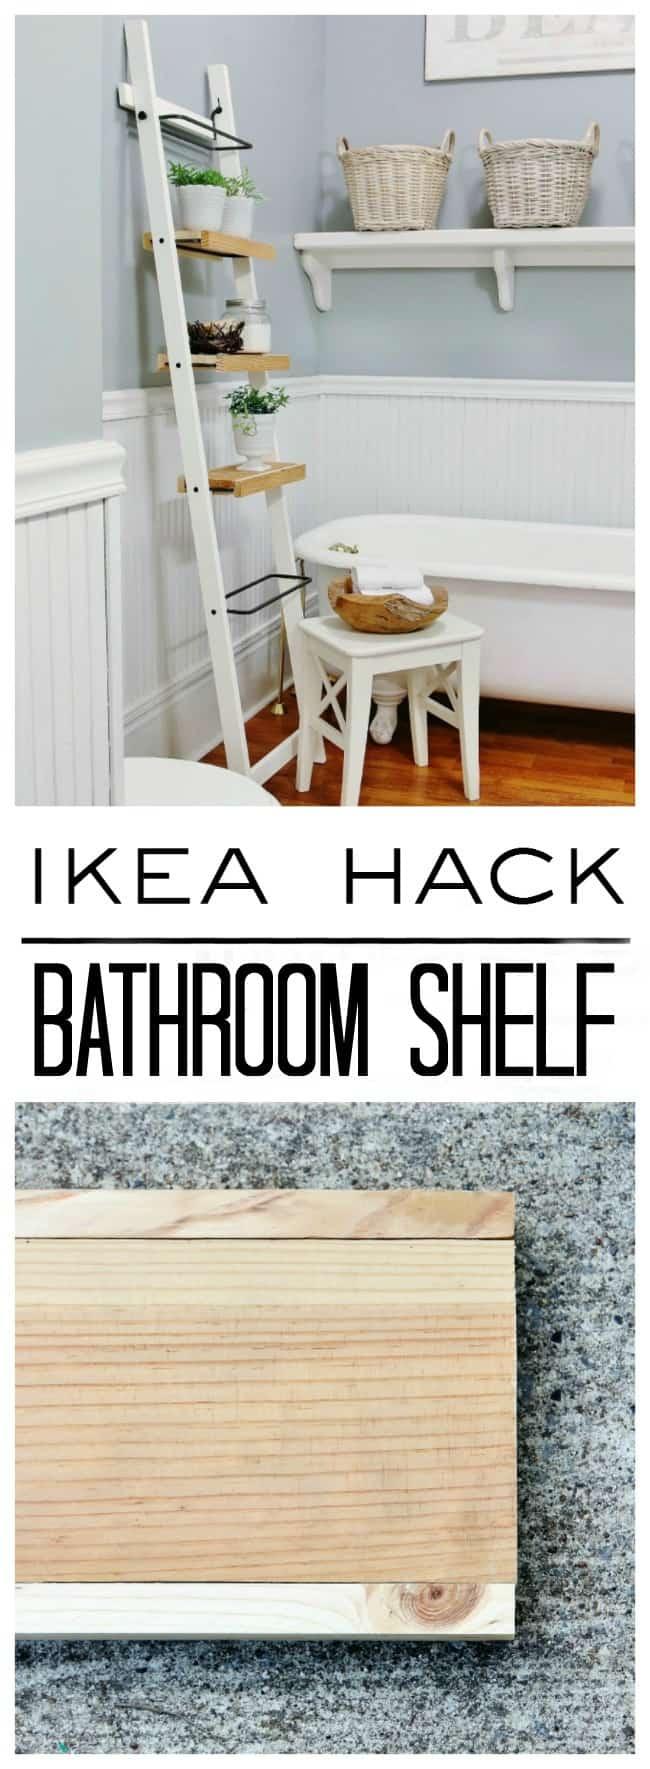 DIY IKEA hack for your bathroom